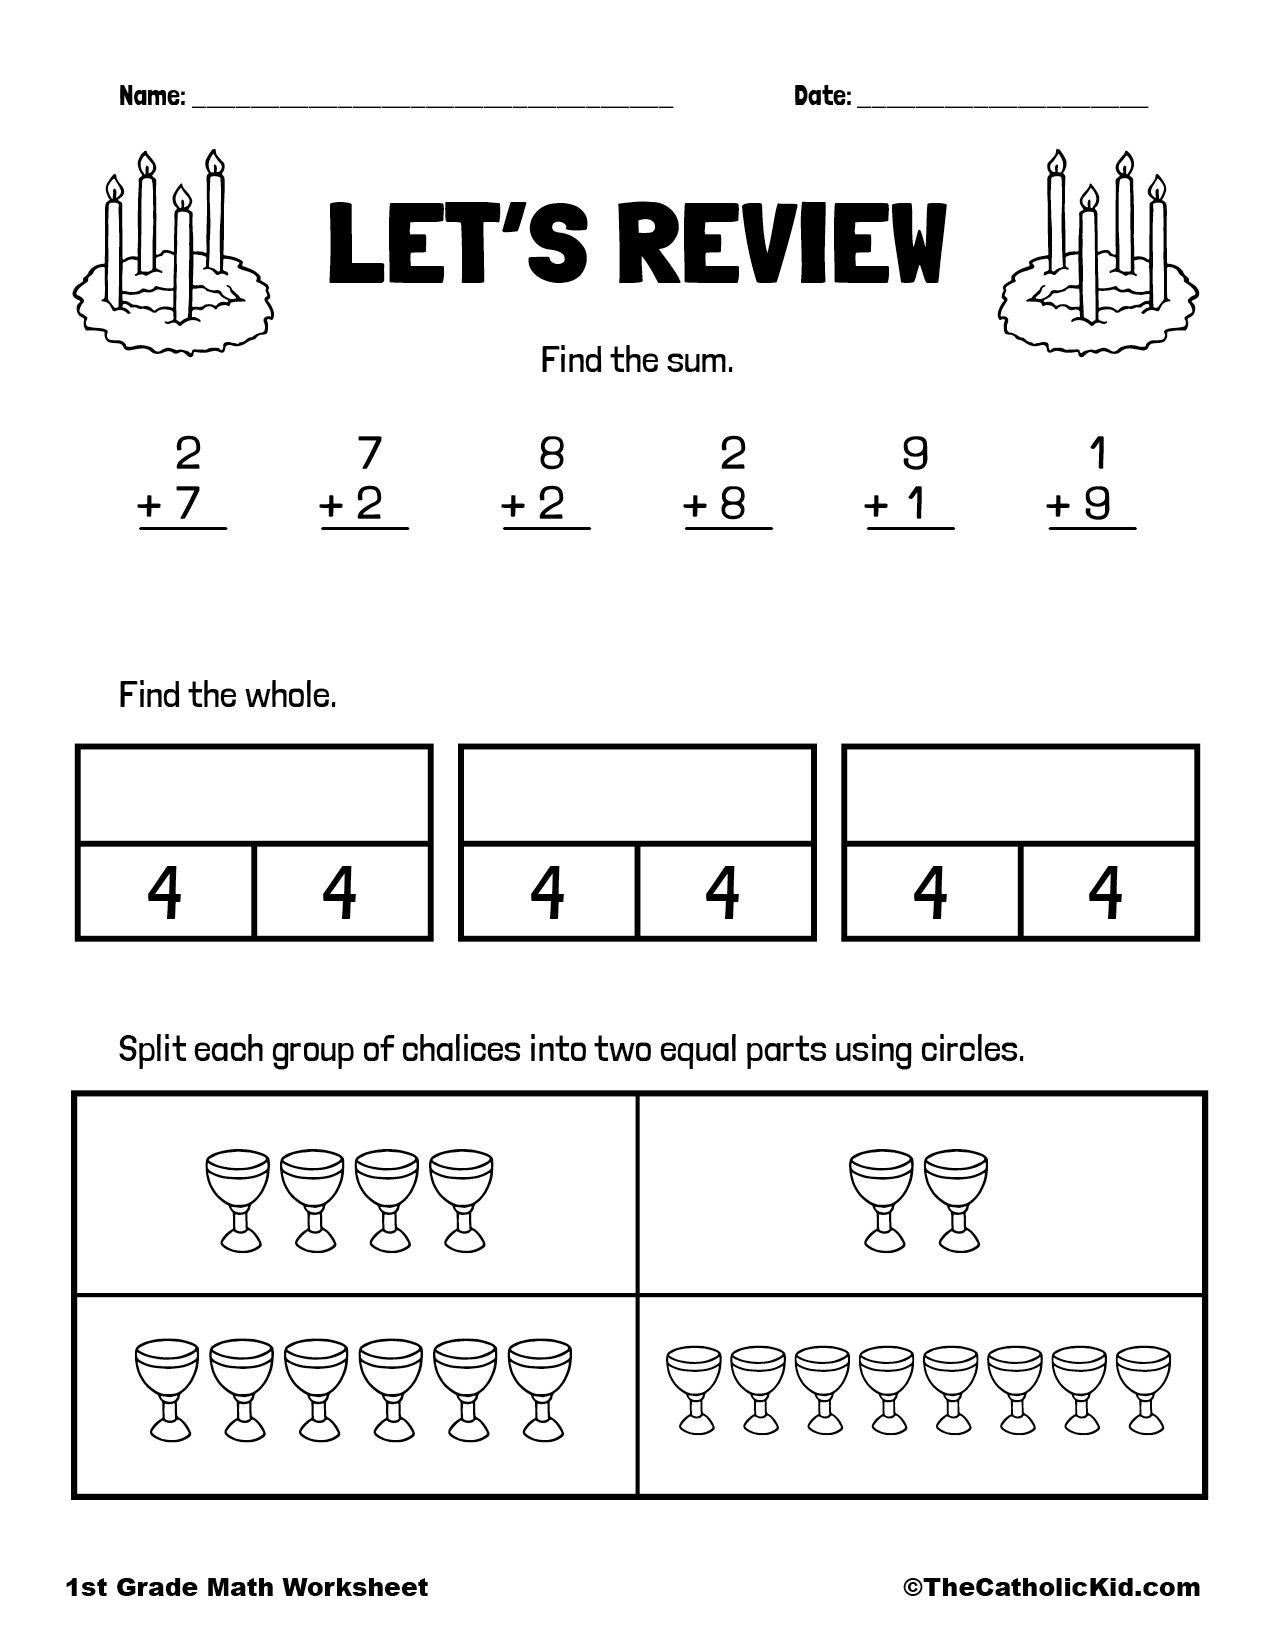 Addition & Fraction Review - 1st Grade Math Worksheet Catholic